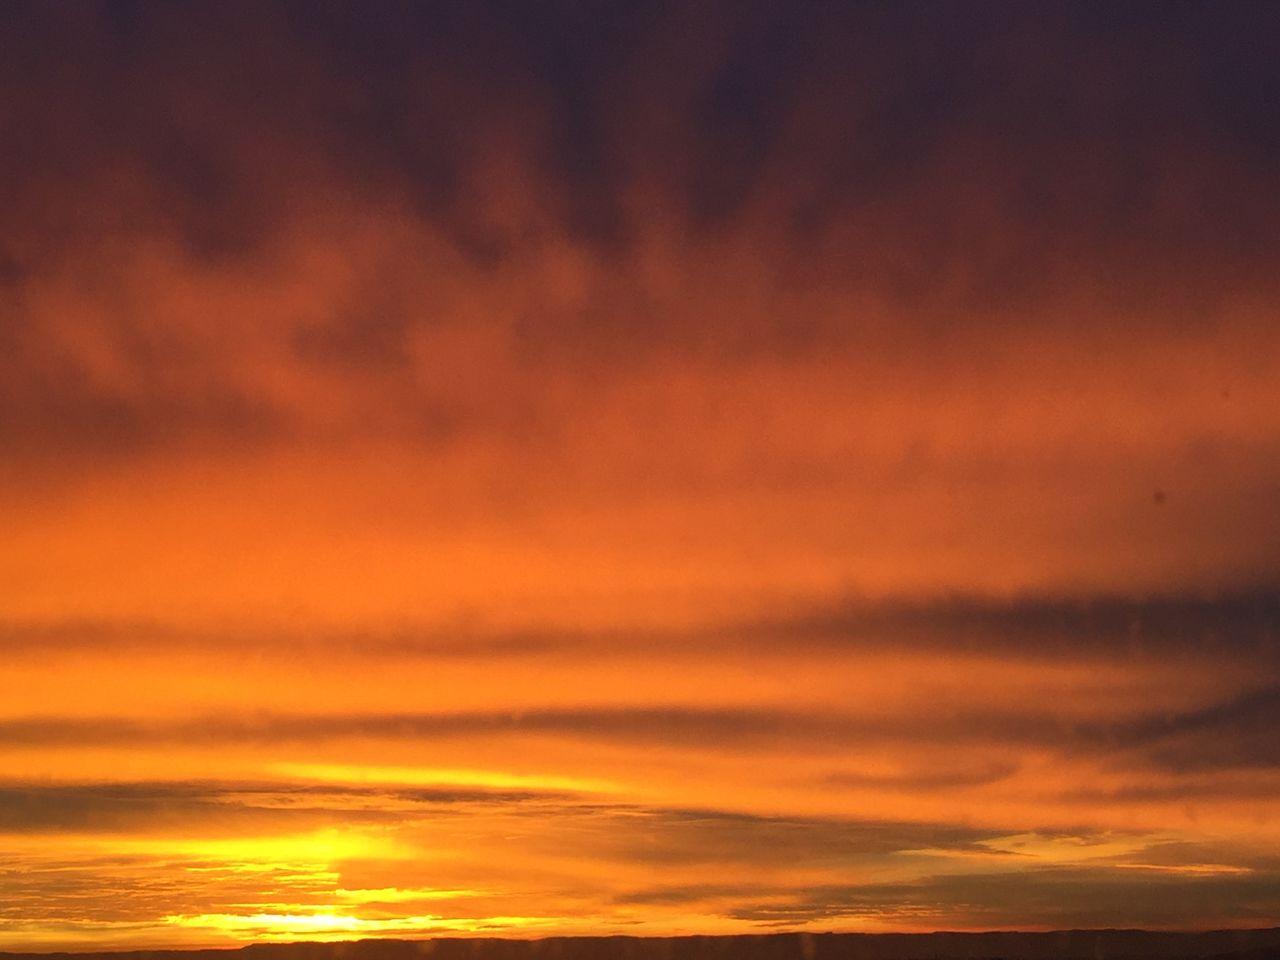 Sonnenaufgang 23.11. IMG_7537